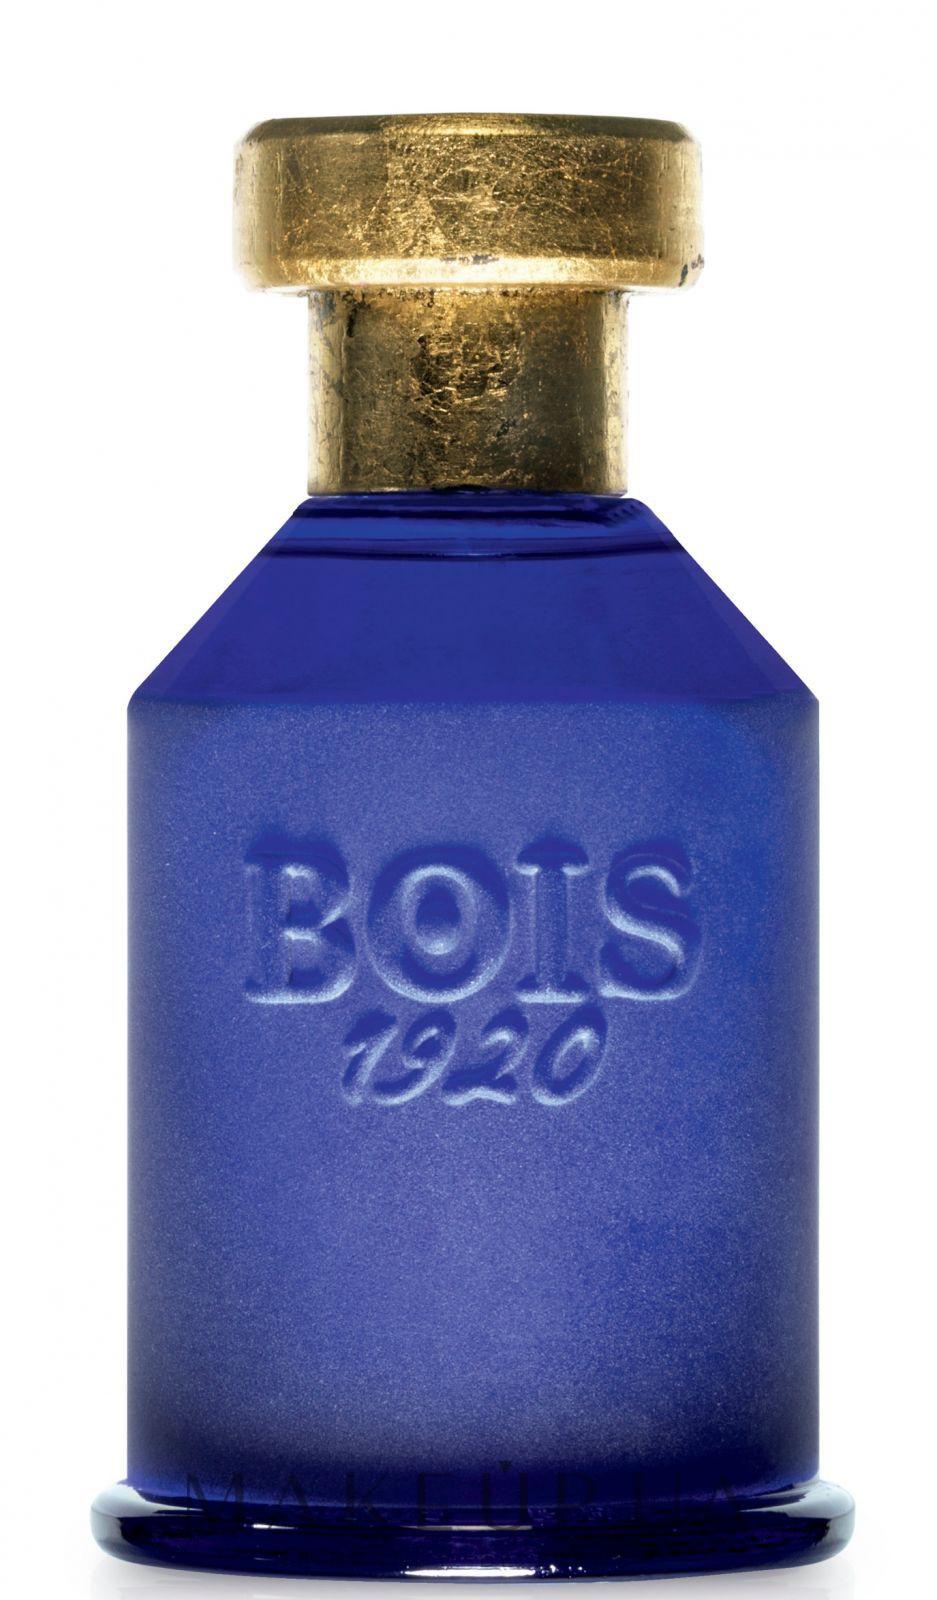 Bois 1920 Oltremare туалетная вода 100мл тестер (Боис 1920 Ольтремар)